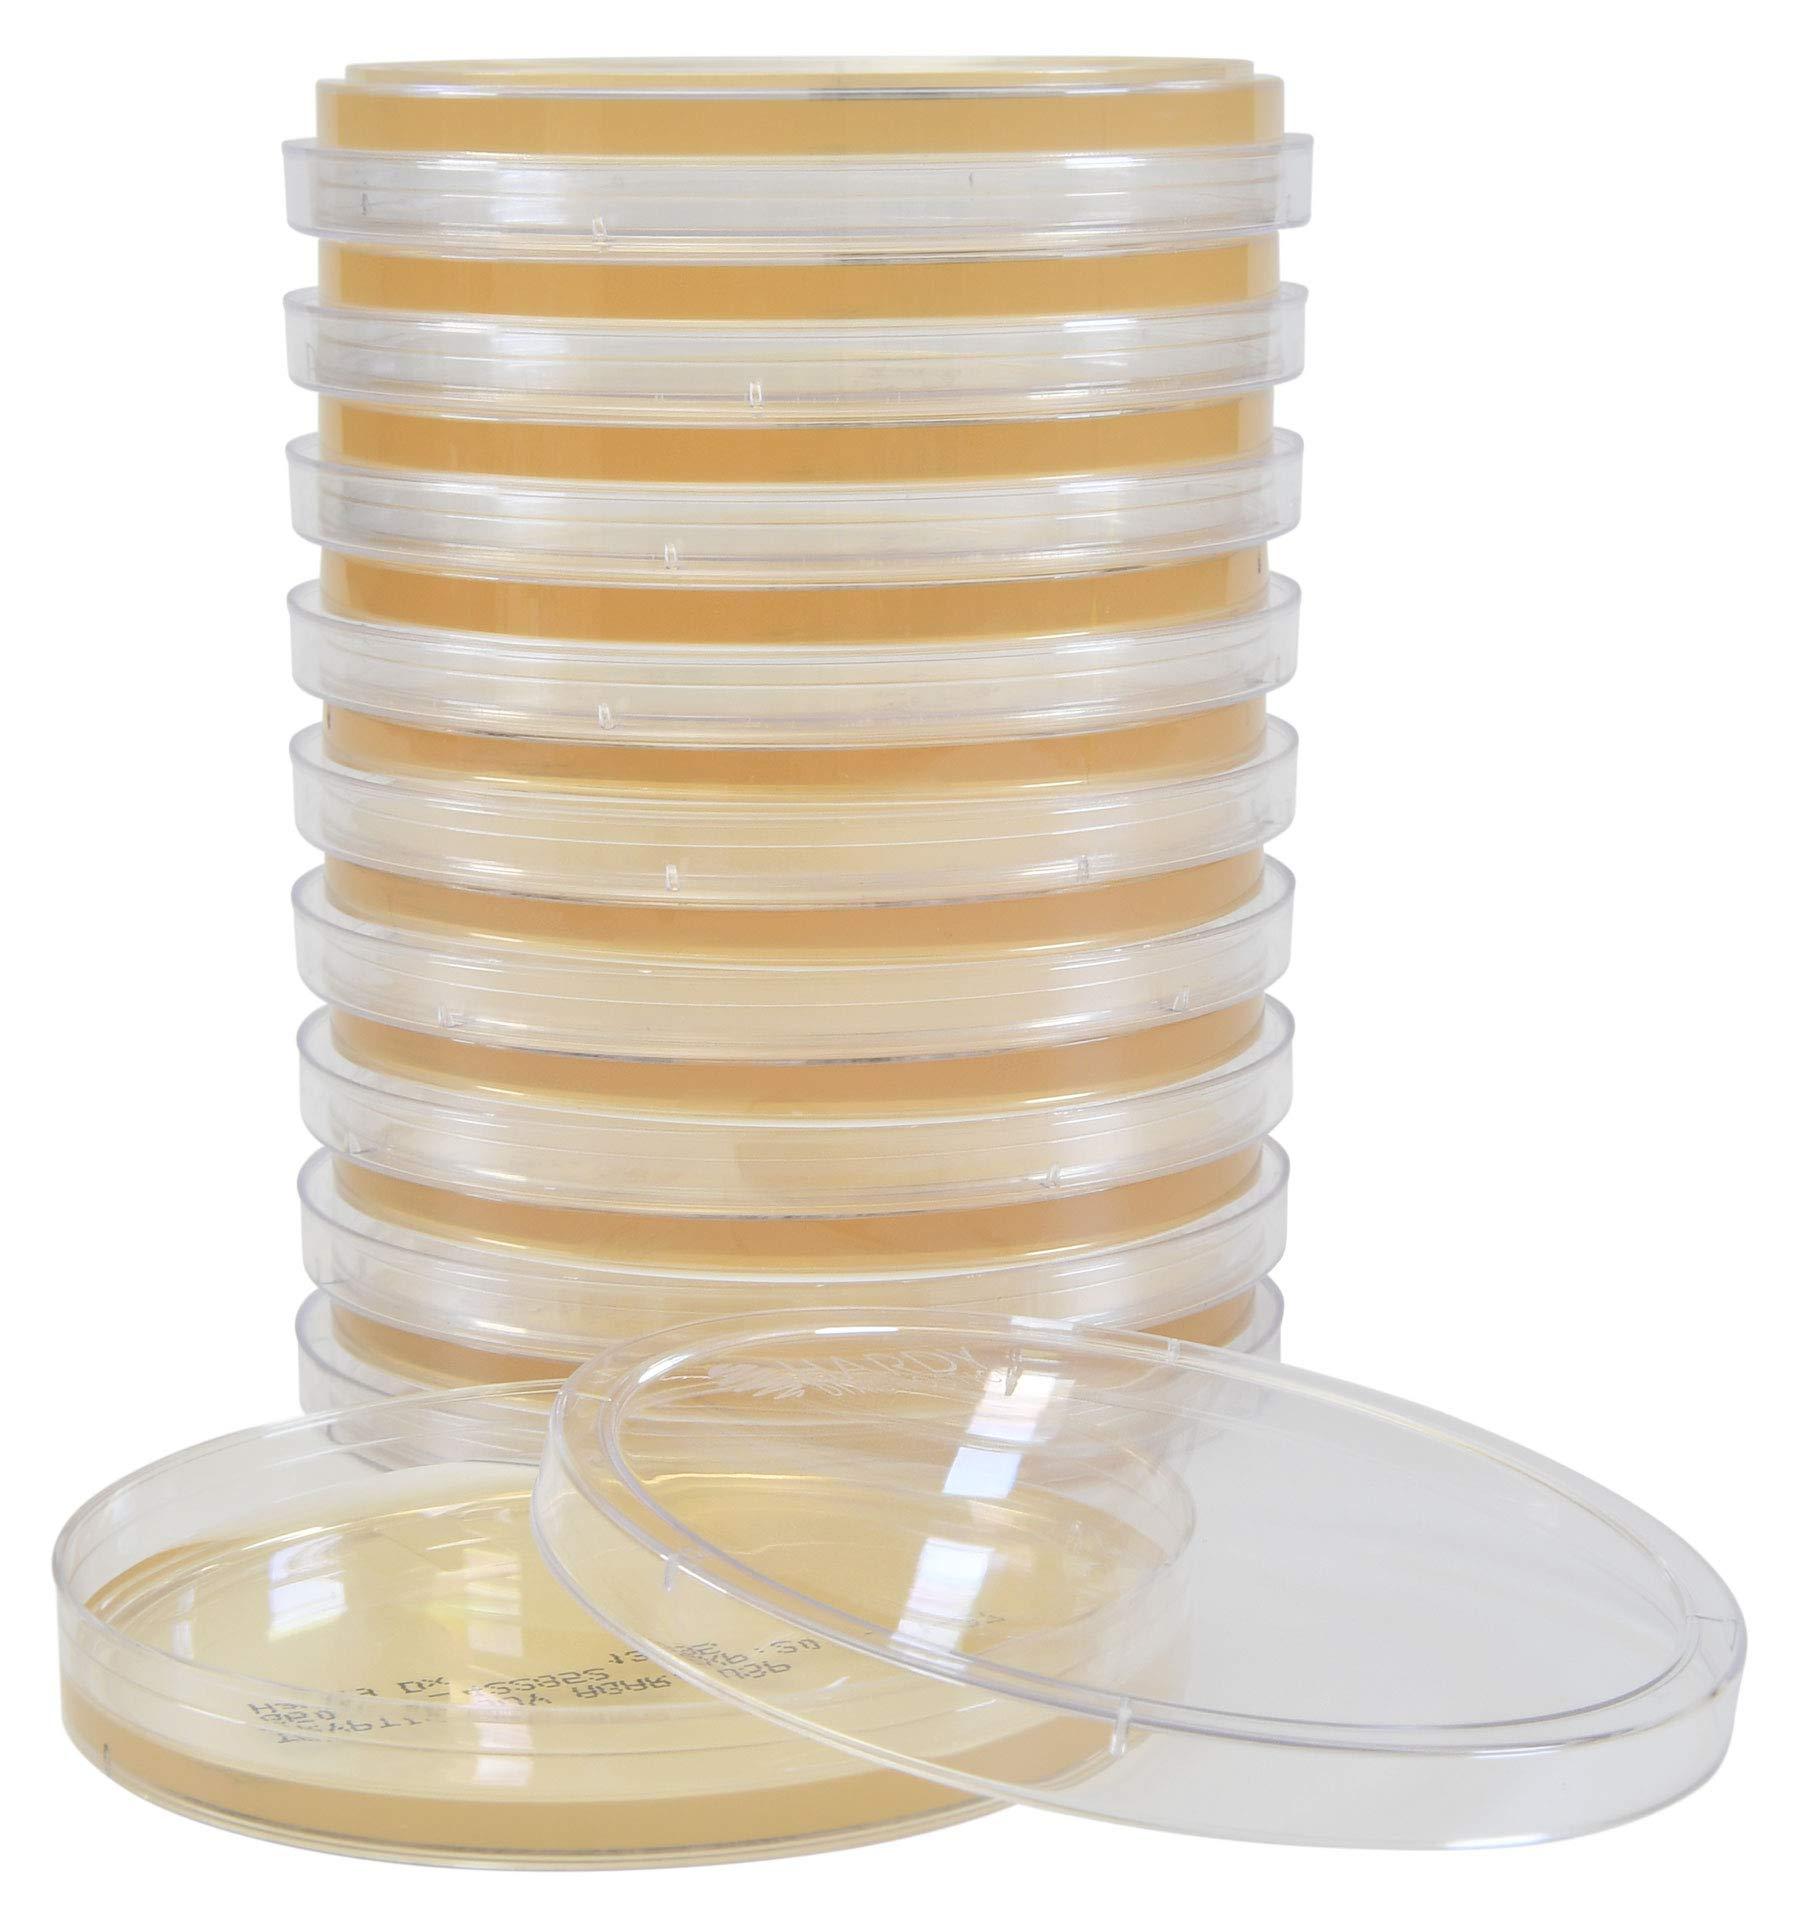 Tryptic Soy Agar (TSA), USP, a General Growth Medium for Microorganisms, 10 Plates Per Pack, by Hardy Diagnostics by Hardy Diagnostics